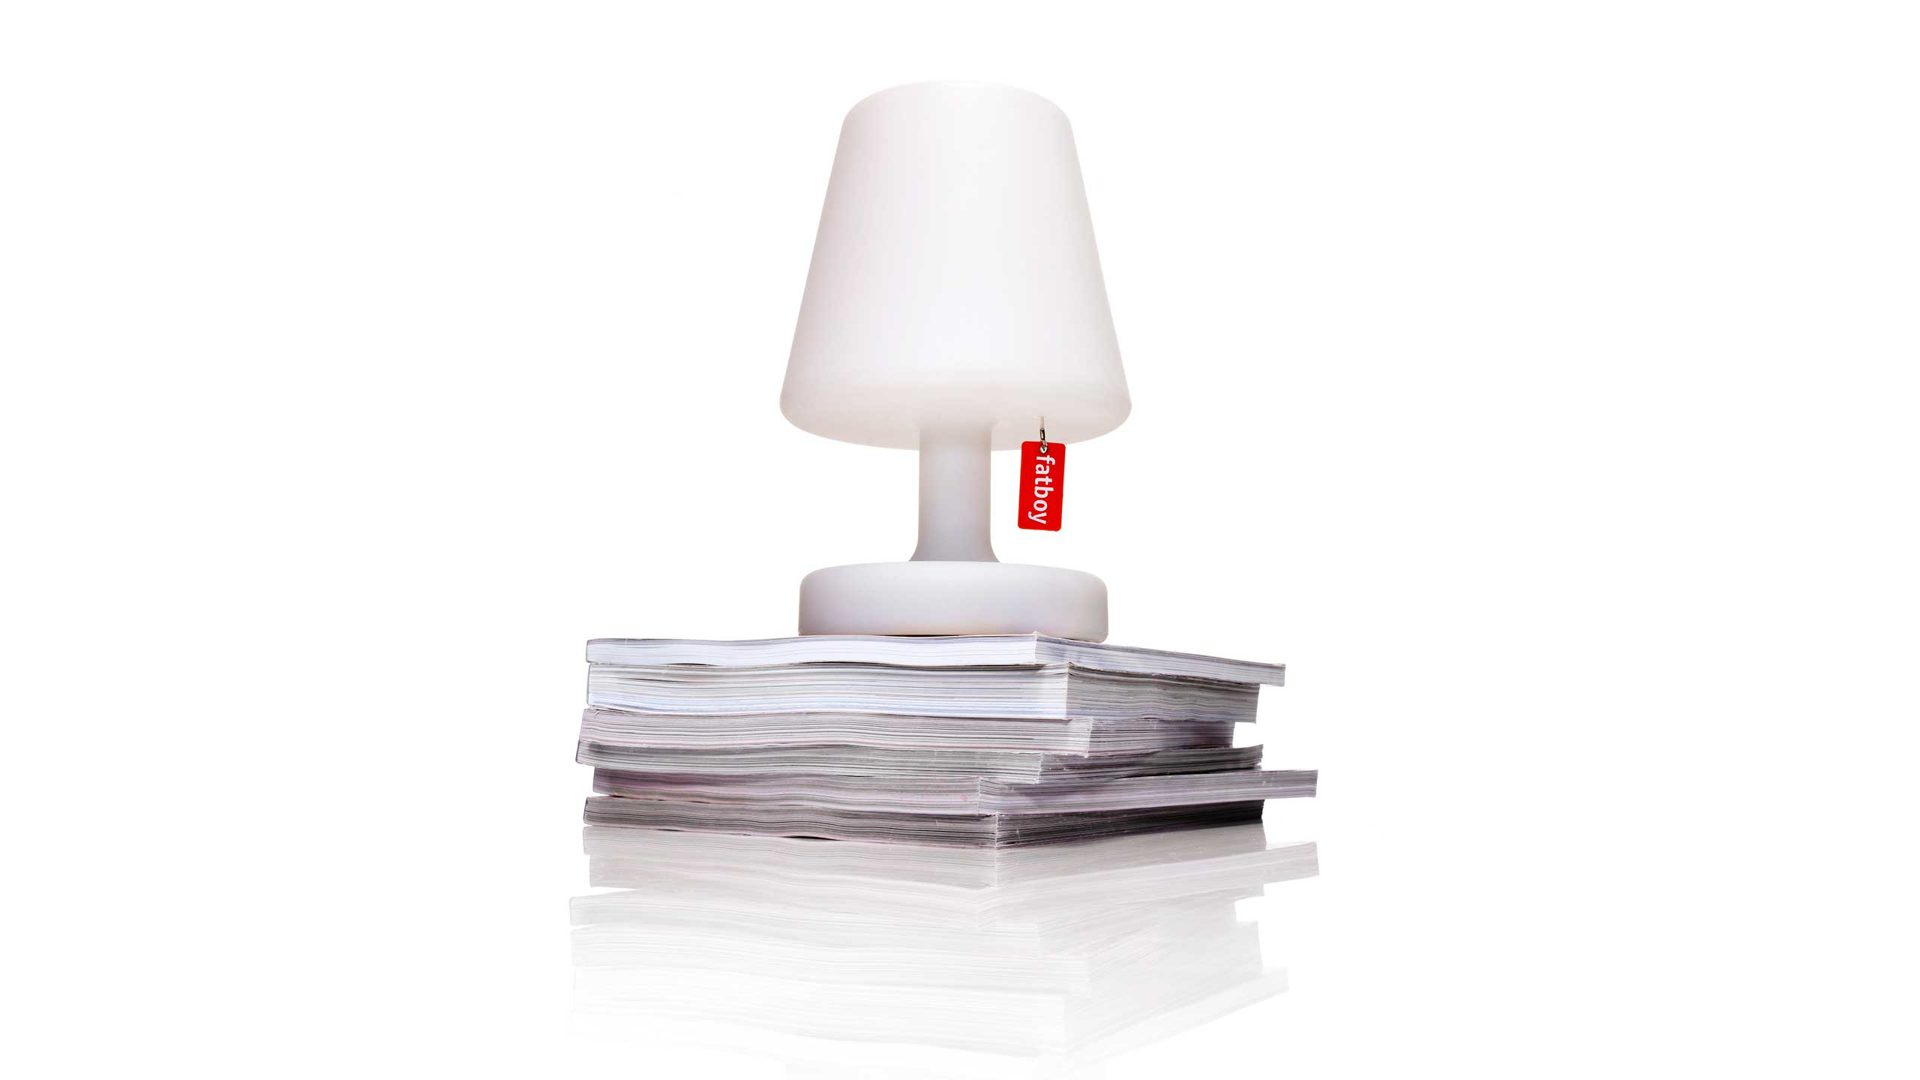 Kabellose Tischlampe Transloetje Eine Led Retro Tischlampe In 8